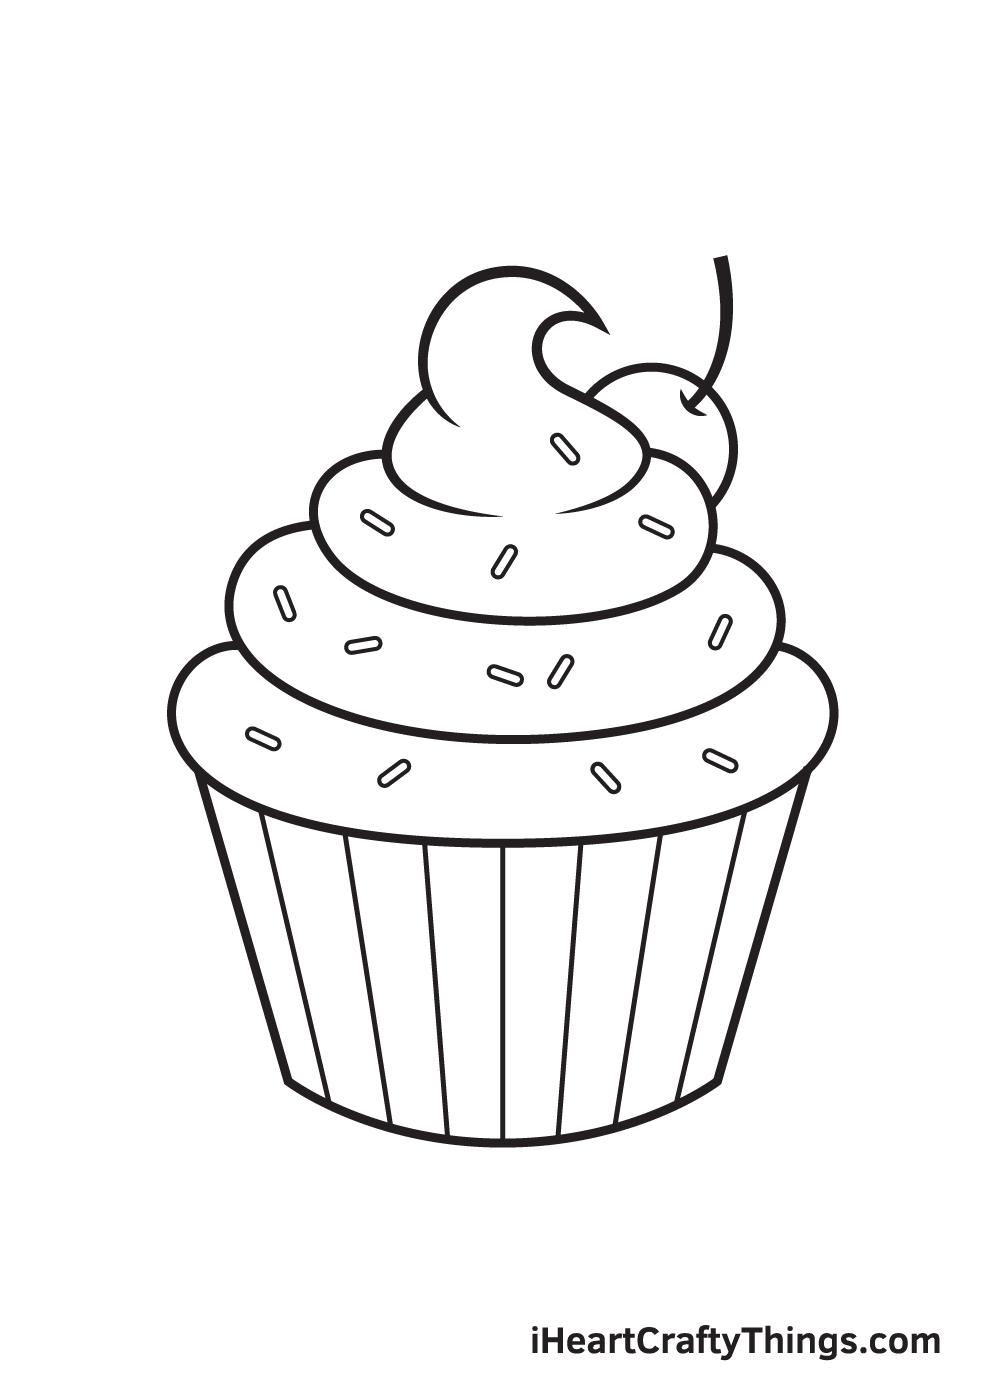 Cupcake Drawing – Step 9